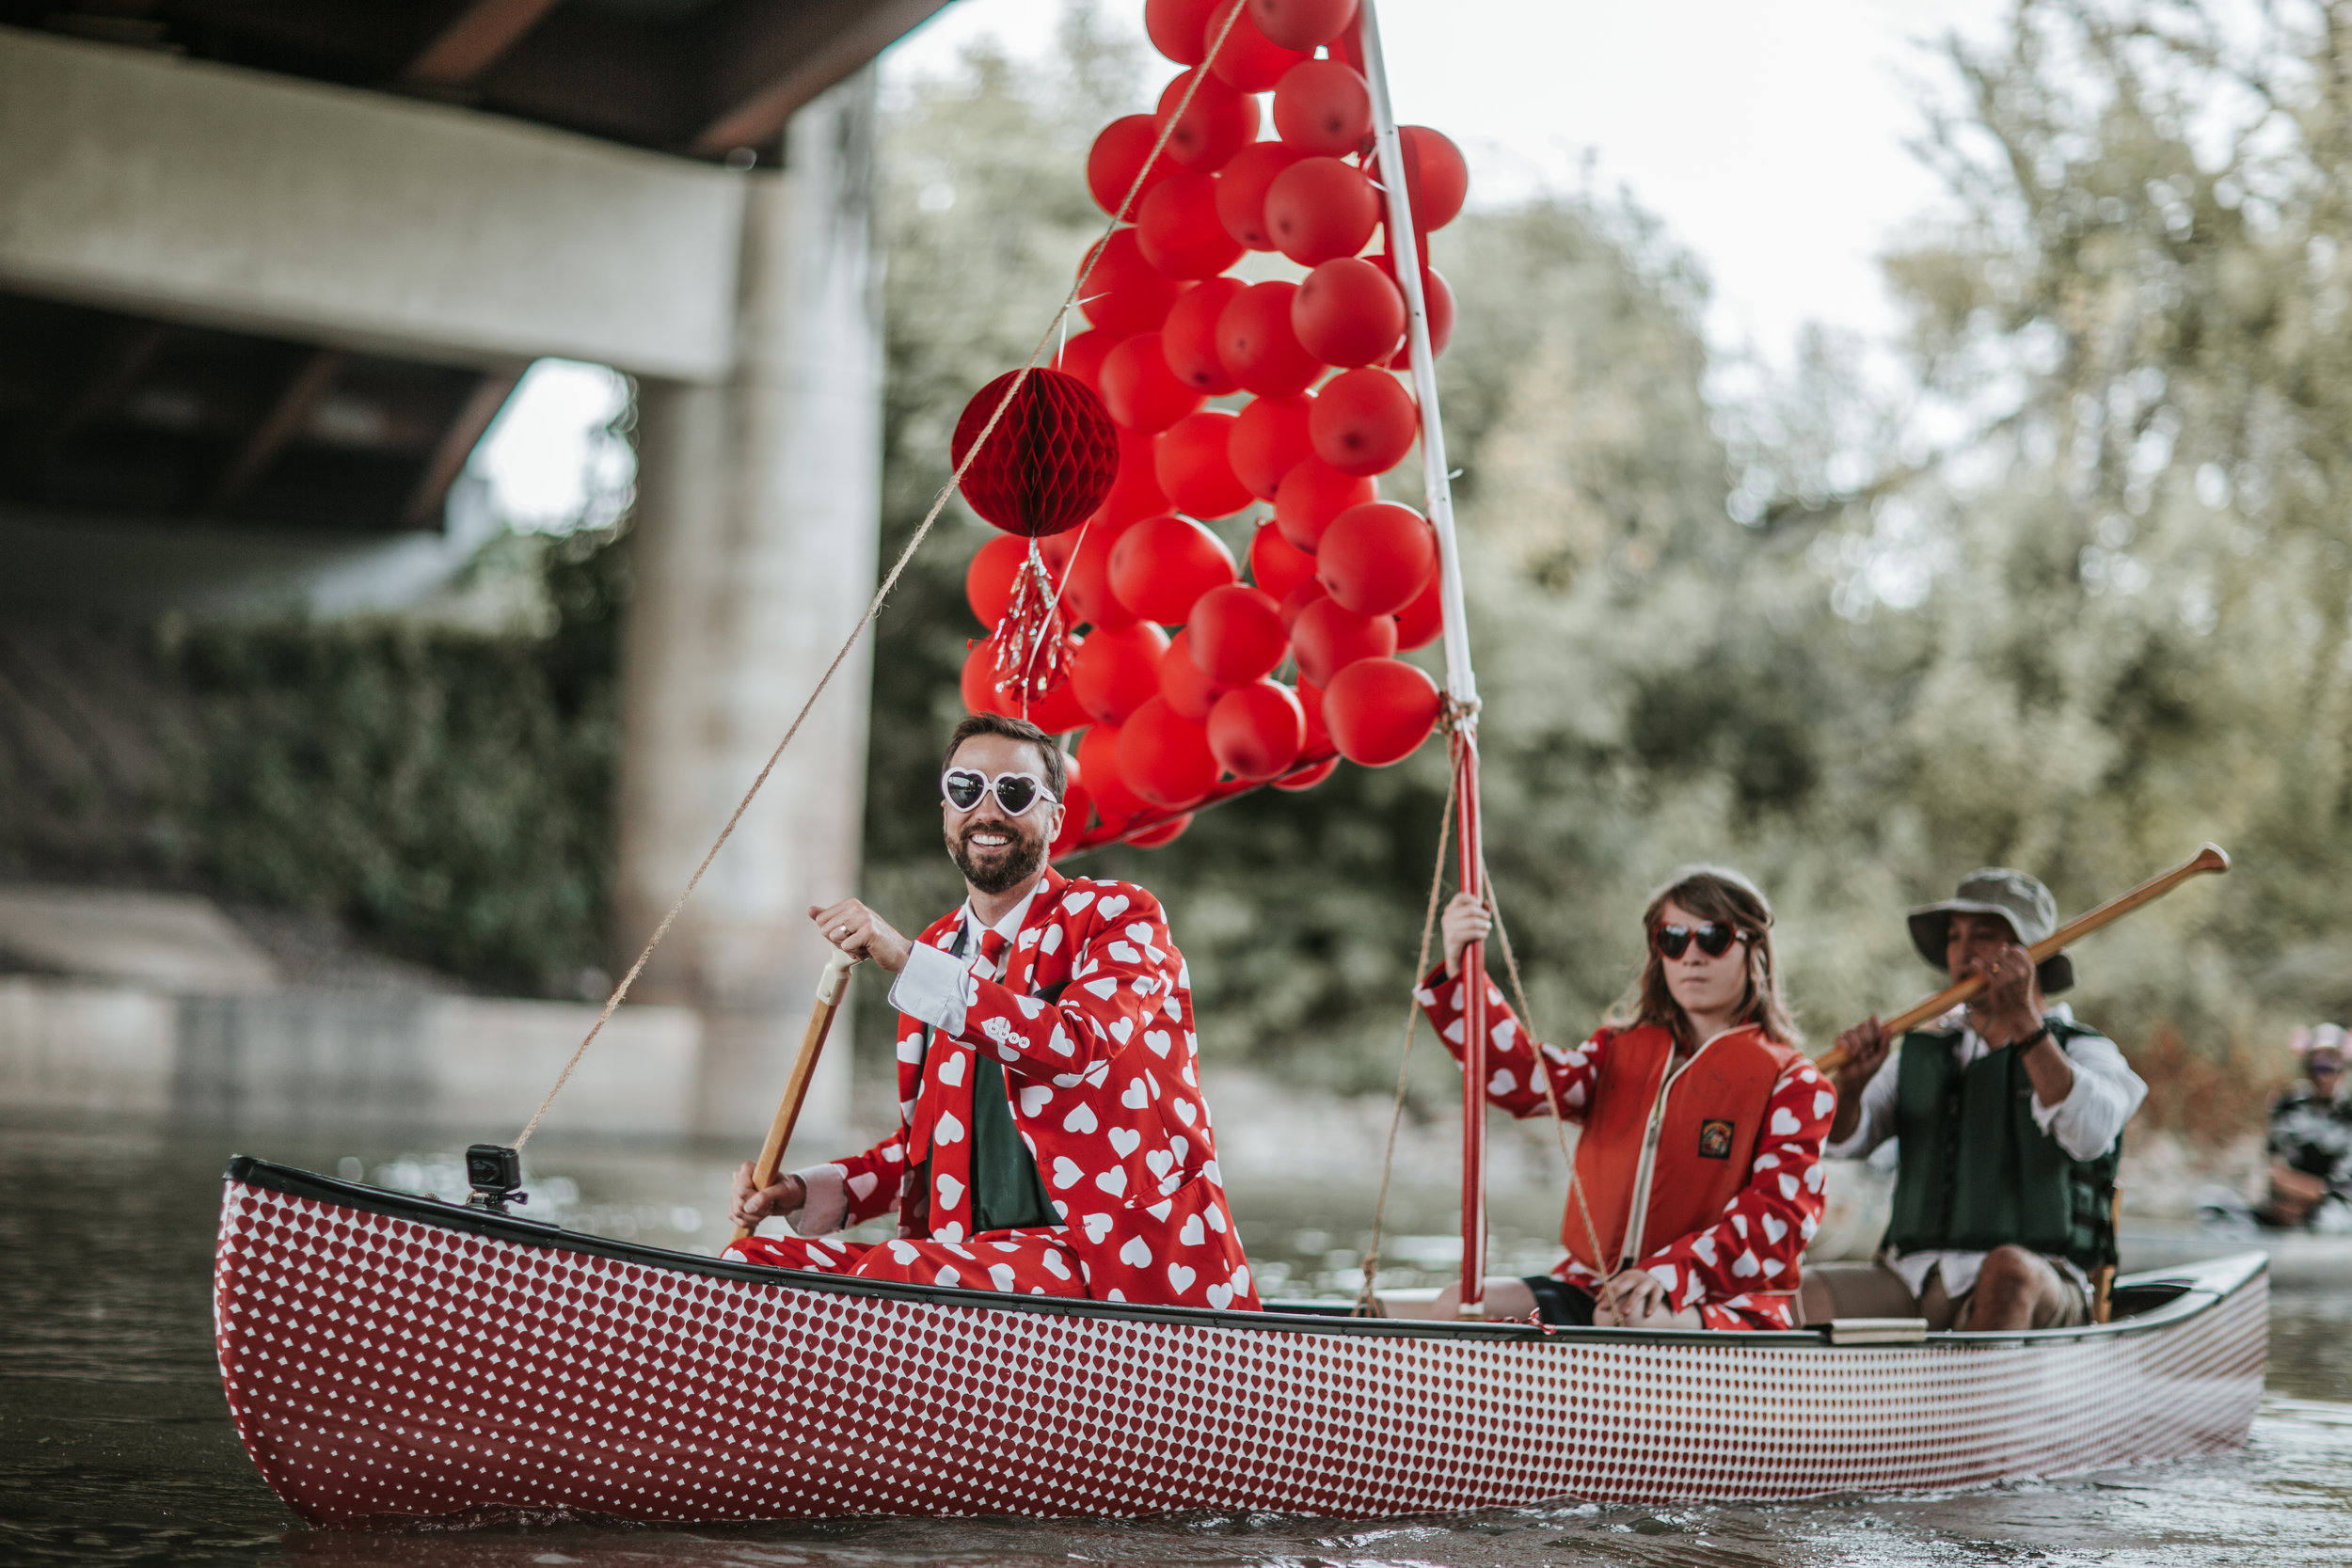 canoeparade-6406.jpg